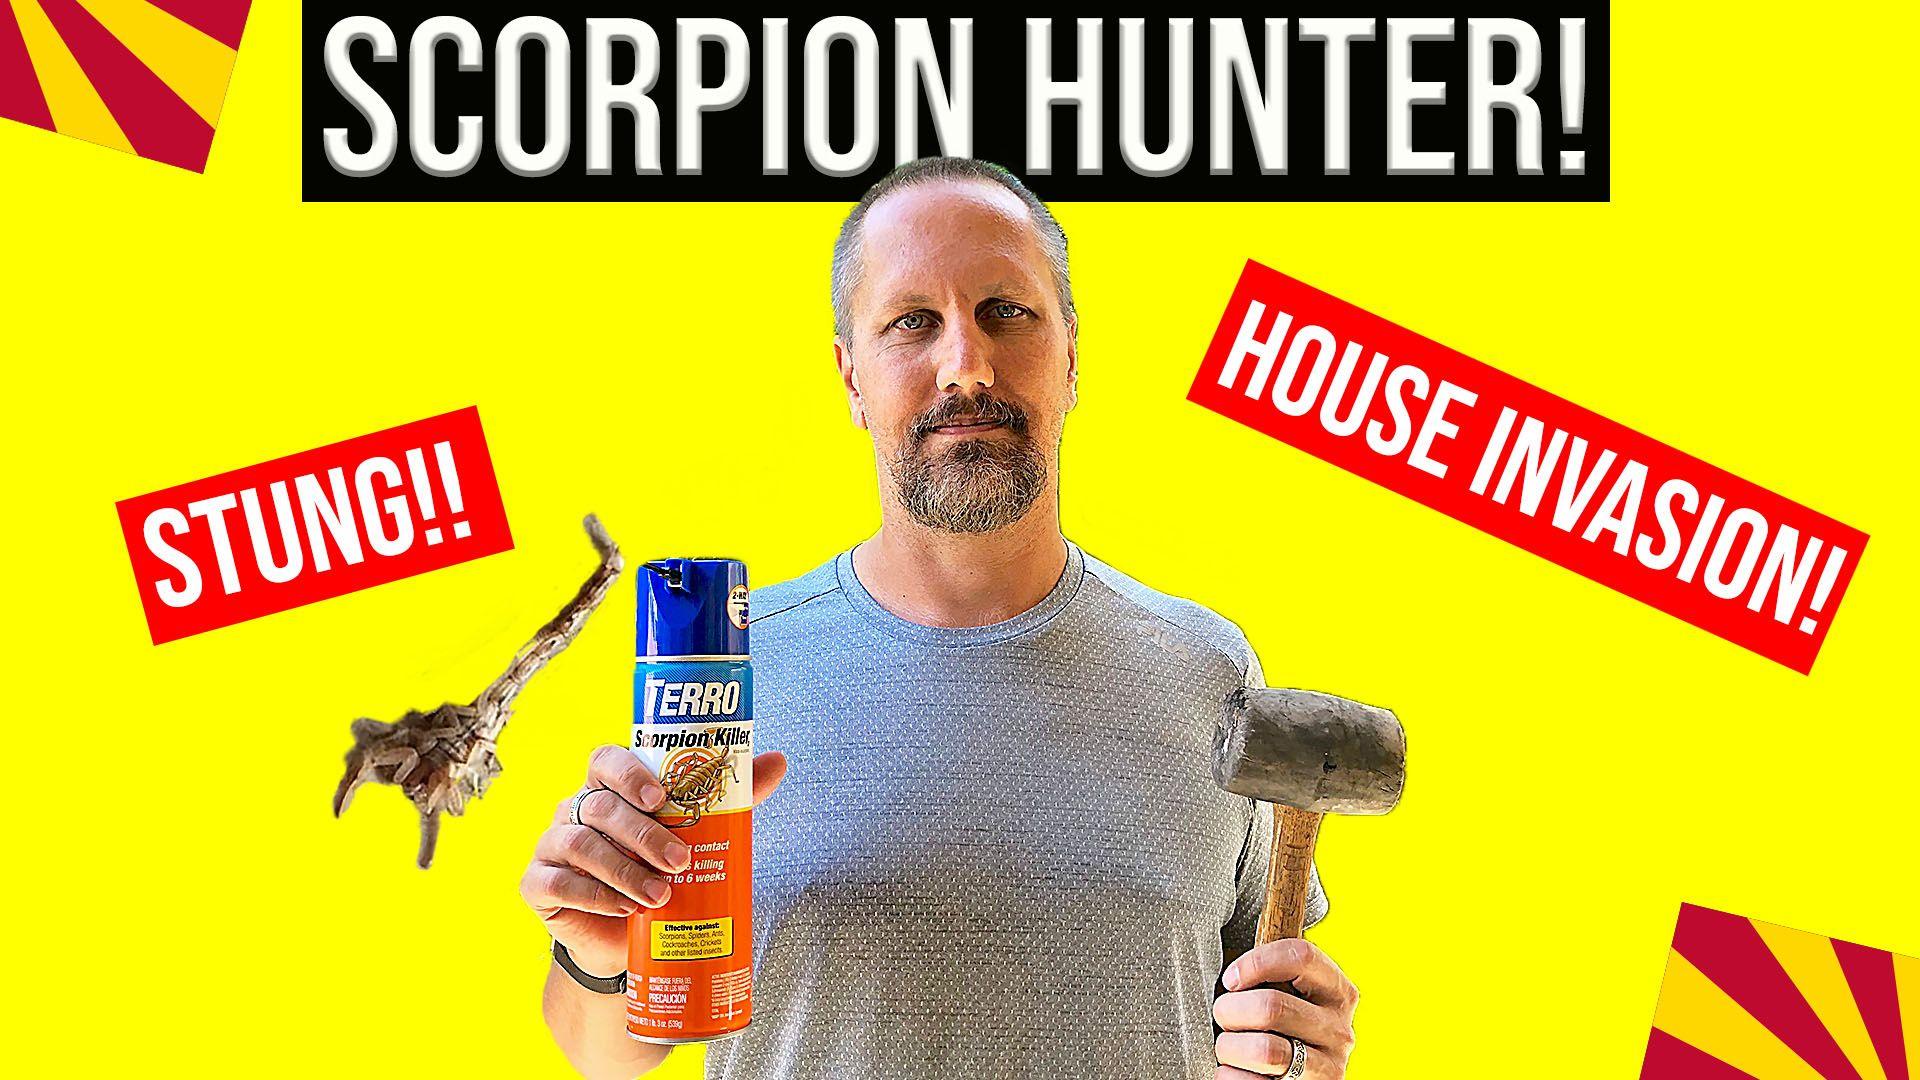 Bark scorpion sting getting rid of arizona scorpions